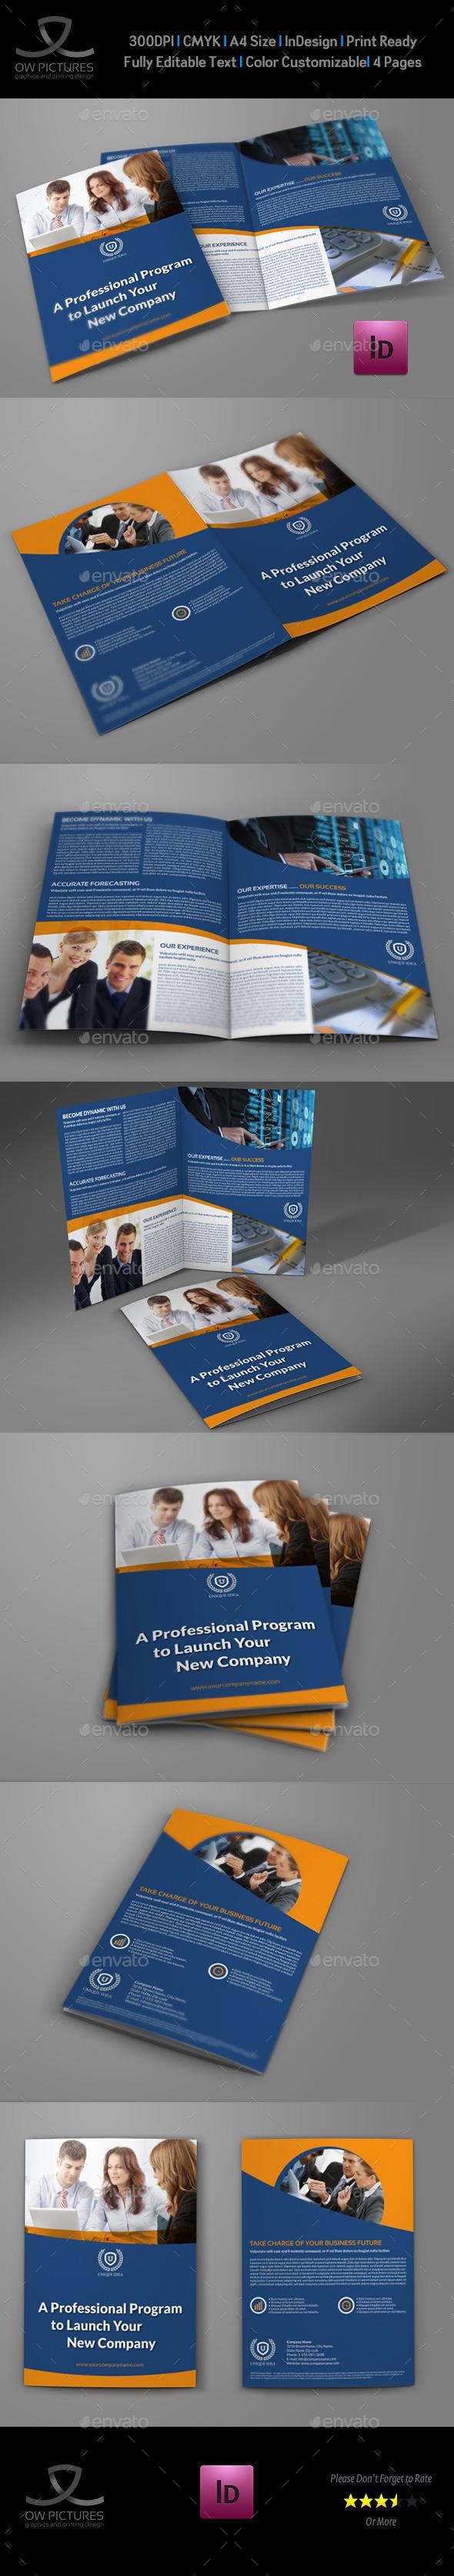 Company Brochure Bi-Fold Template Vol.35 - Corporate Brochures